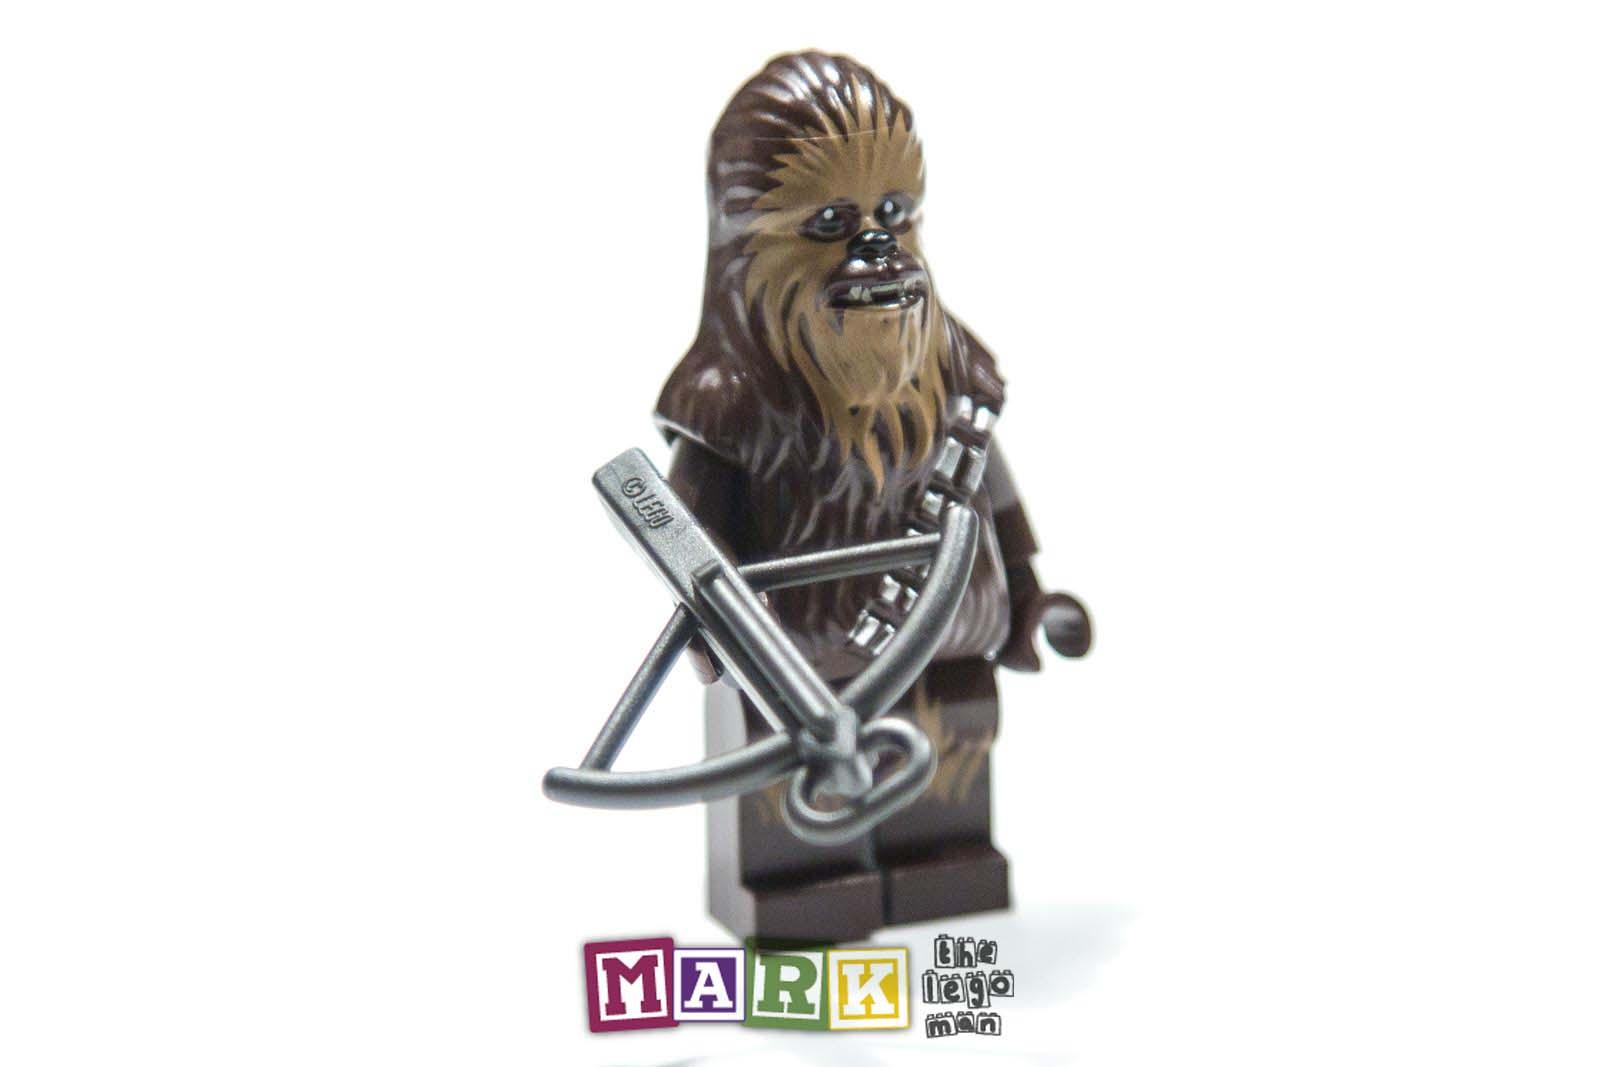 New Lego Star Wars™ Chewbacca Minifig Minifigure | Mad ...